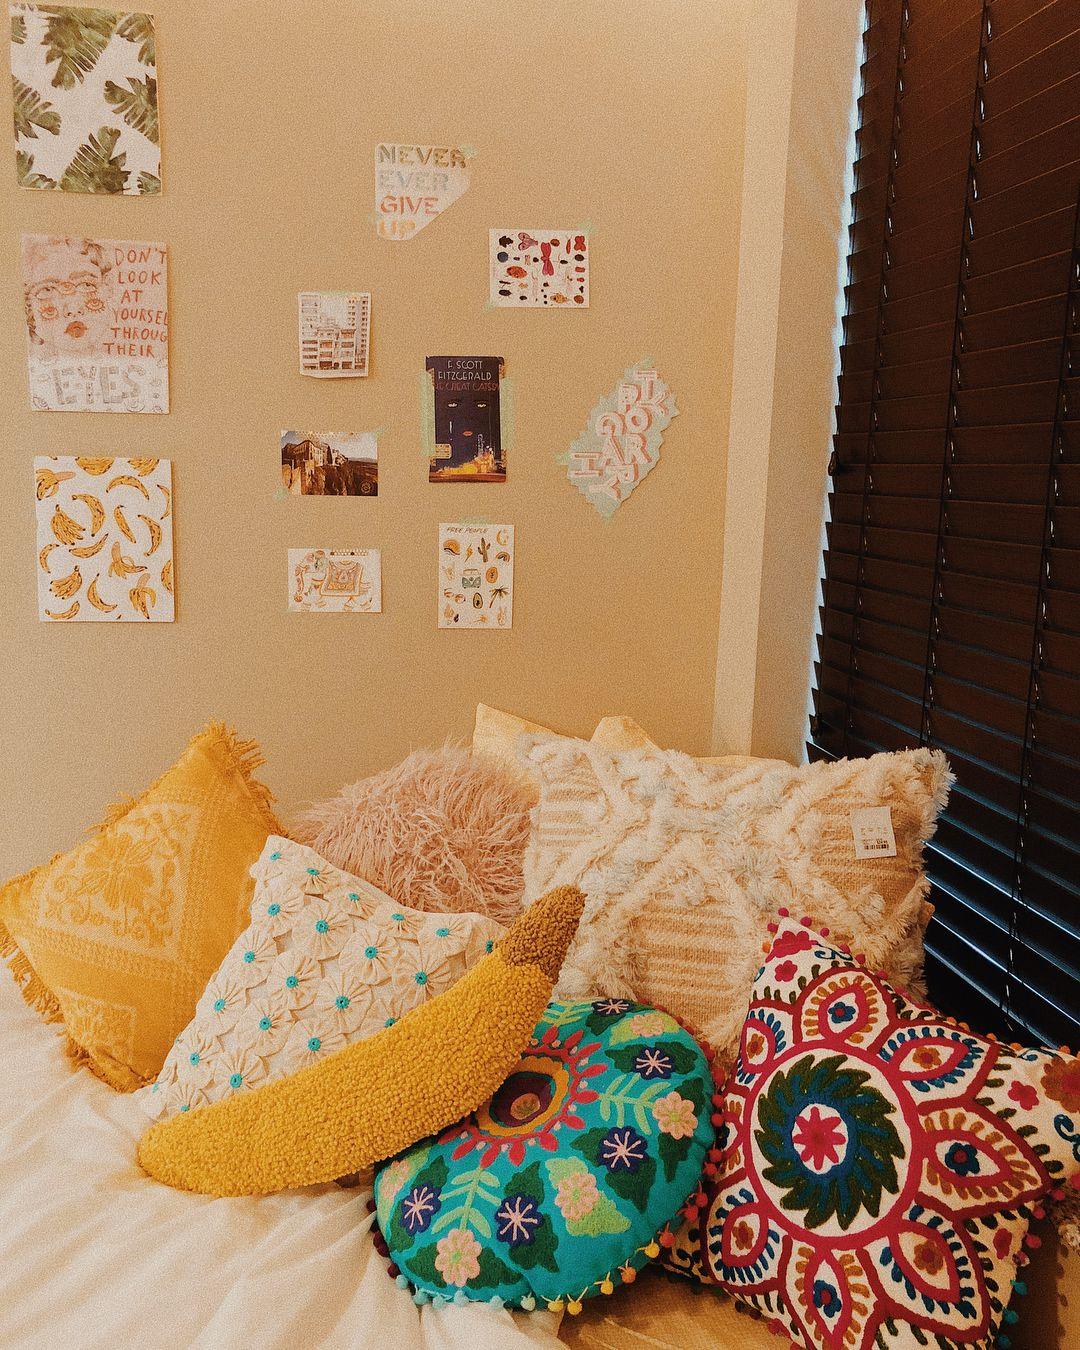 Pinterest Hannahpure Dorm Room Wall Decor Dorm Room Decor Dorm Room Walls